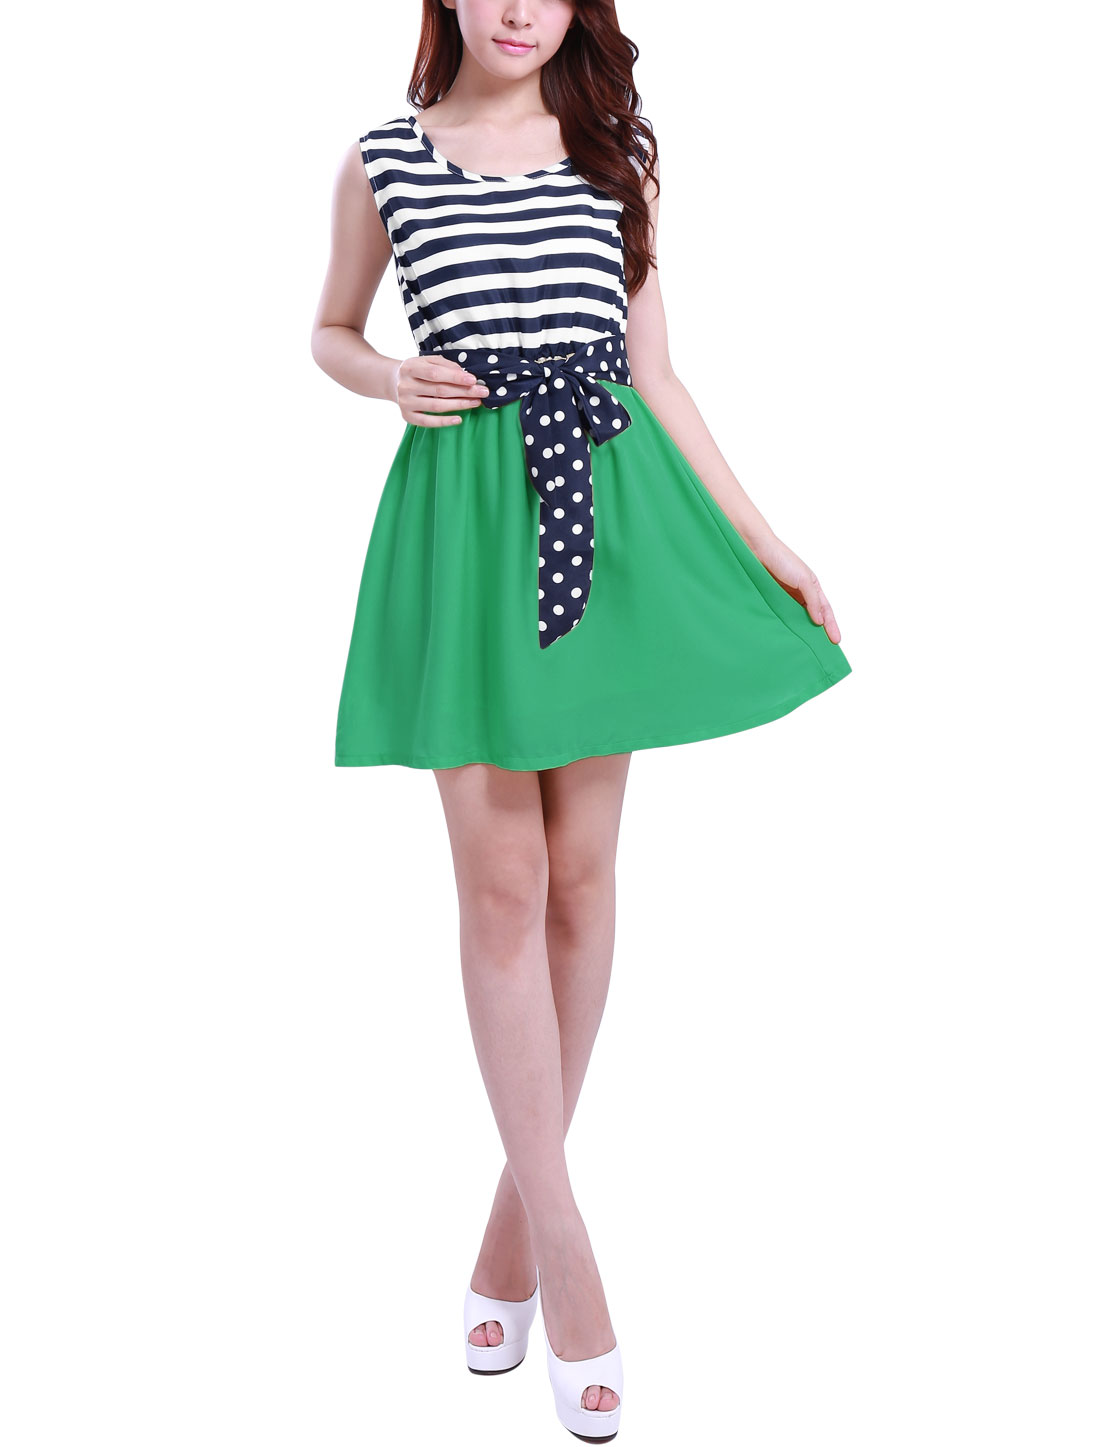 Women Stripe Printed Upper Pullover Green Dark Blue Mini Flare Tank Dress M